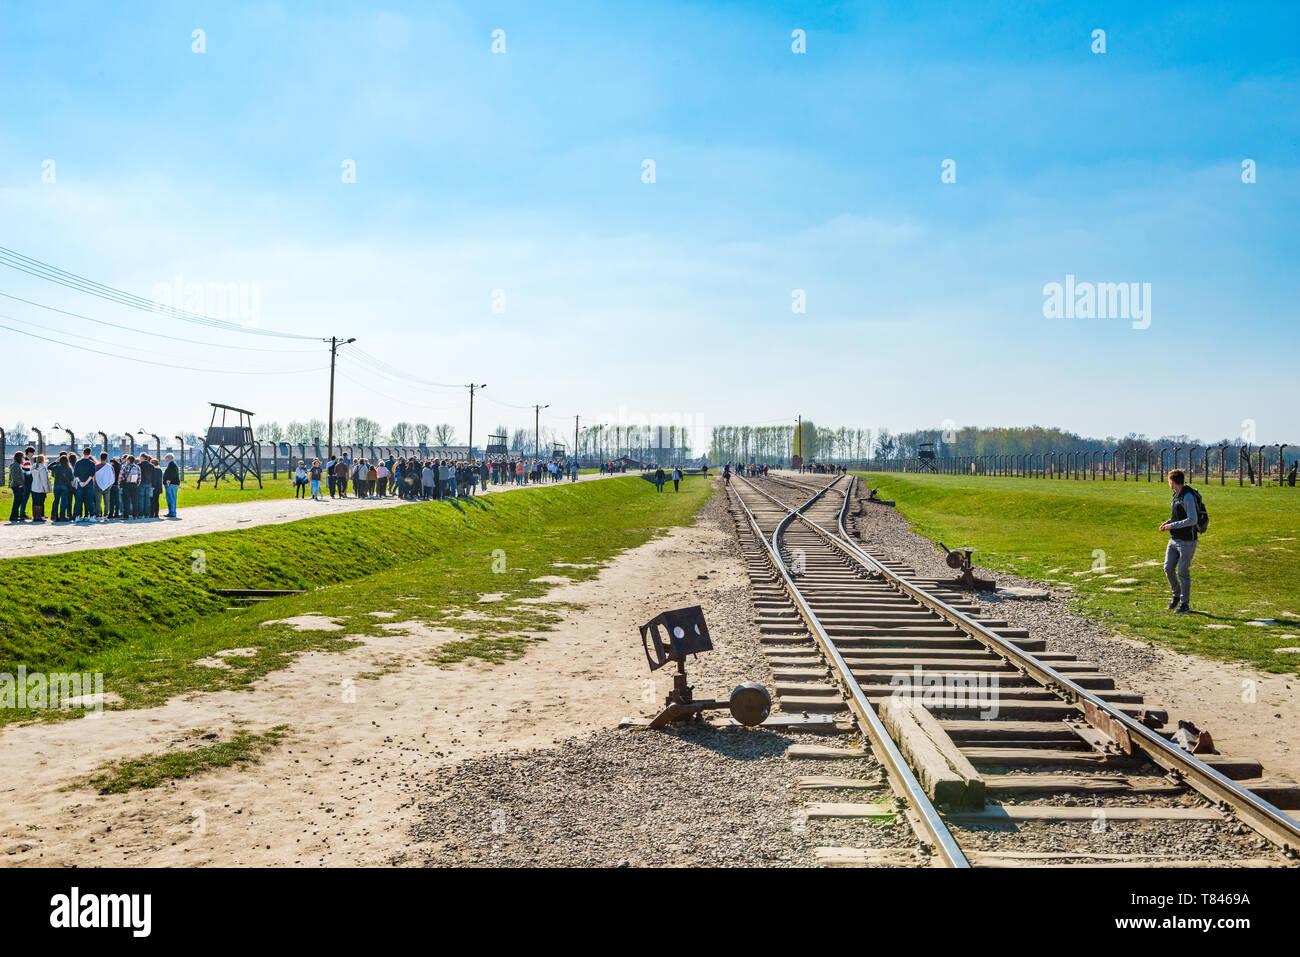 AUSCHWITZ (OSWIECIM), POLAND - APRIL 18, 2019: Railway platform in Auschwitz Birkenau extermination death camp, Poland. This platform was used as sele - Stock Image